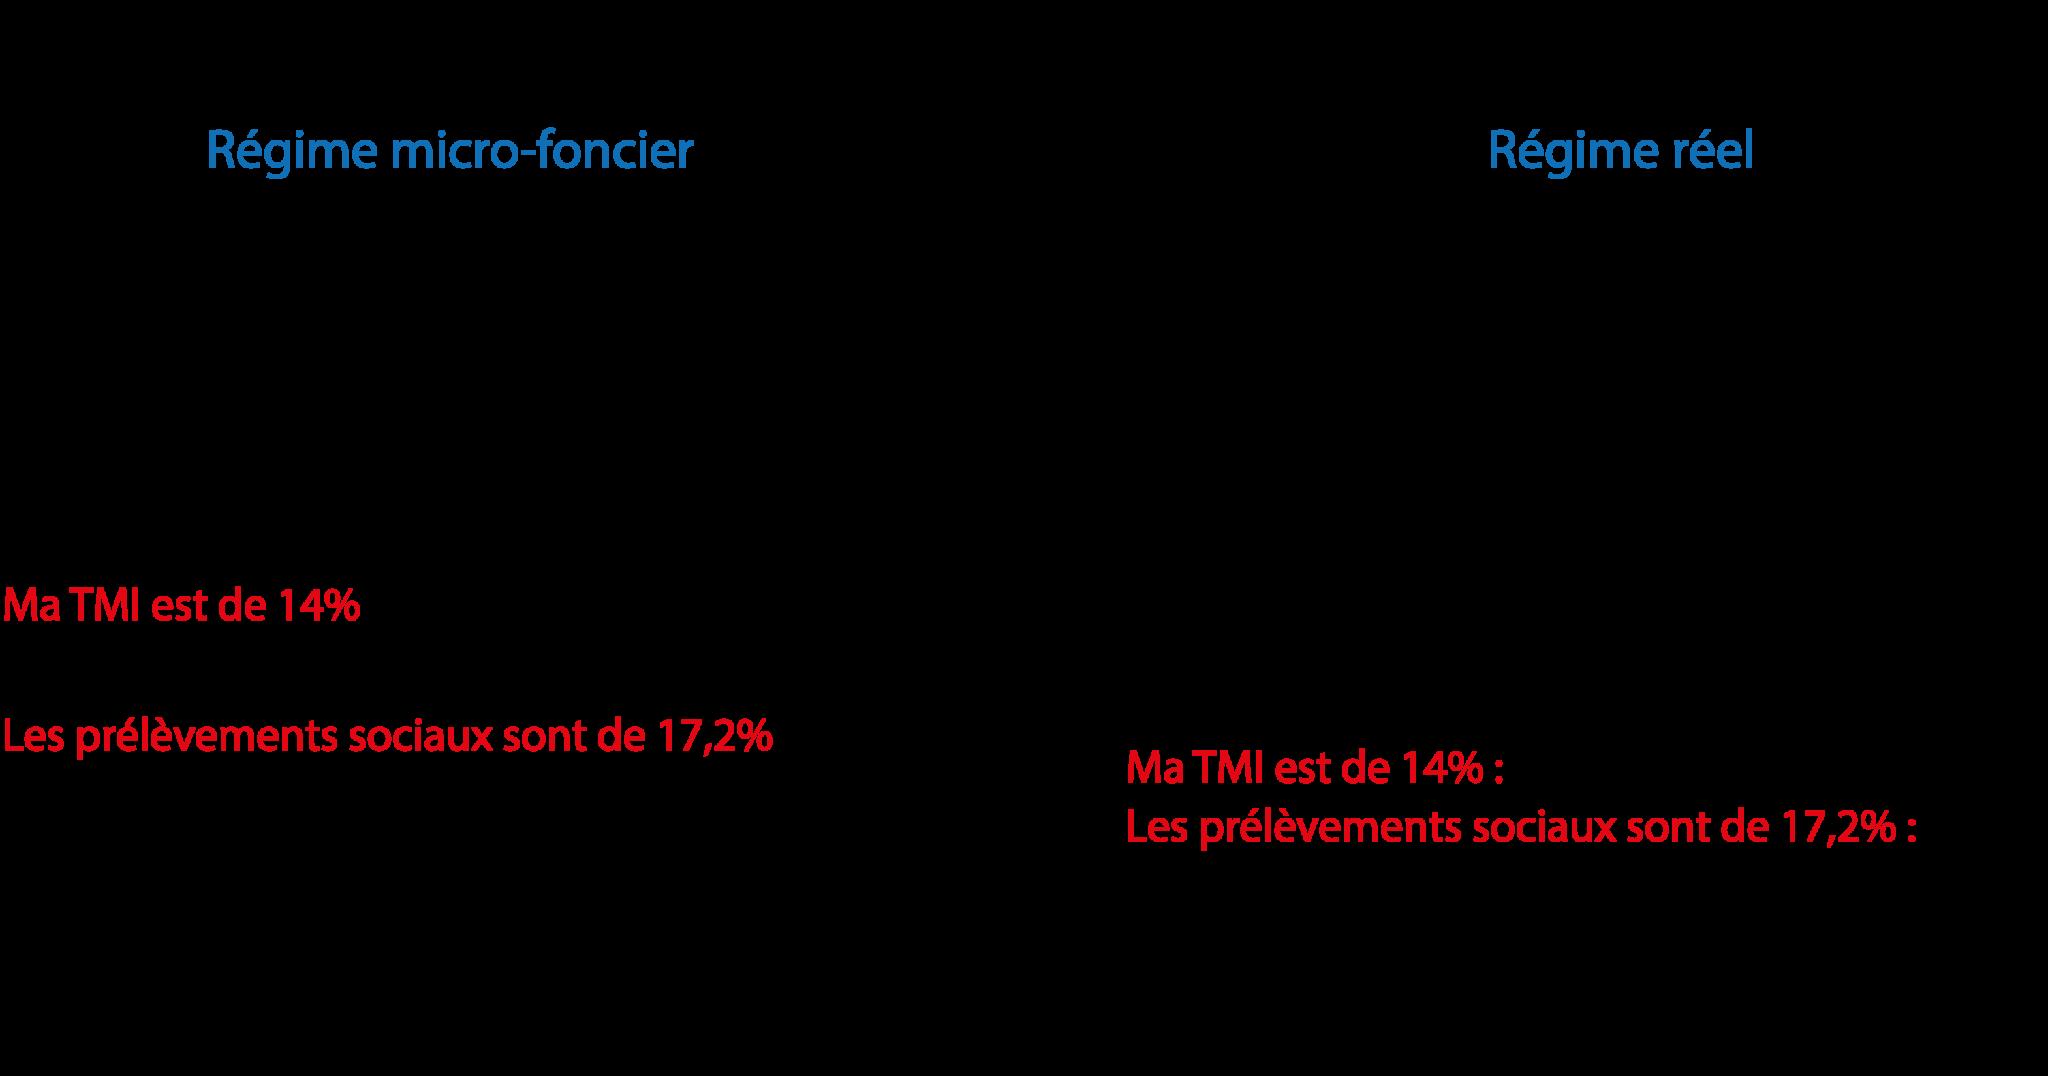 deficit-foncier-impots-loyers-revenus-fonciers-bertrand-demanes-desktop